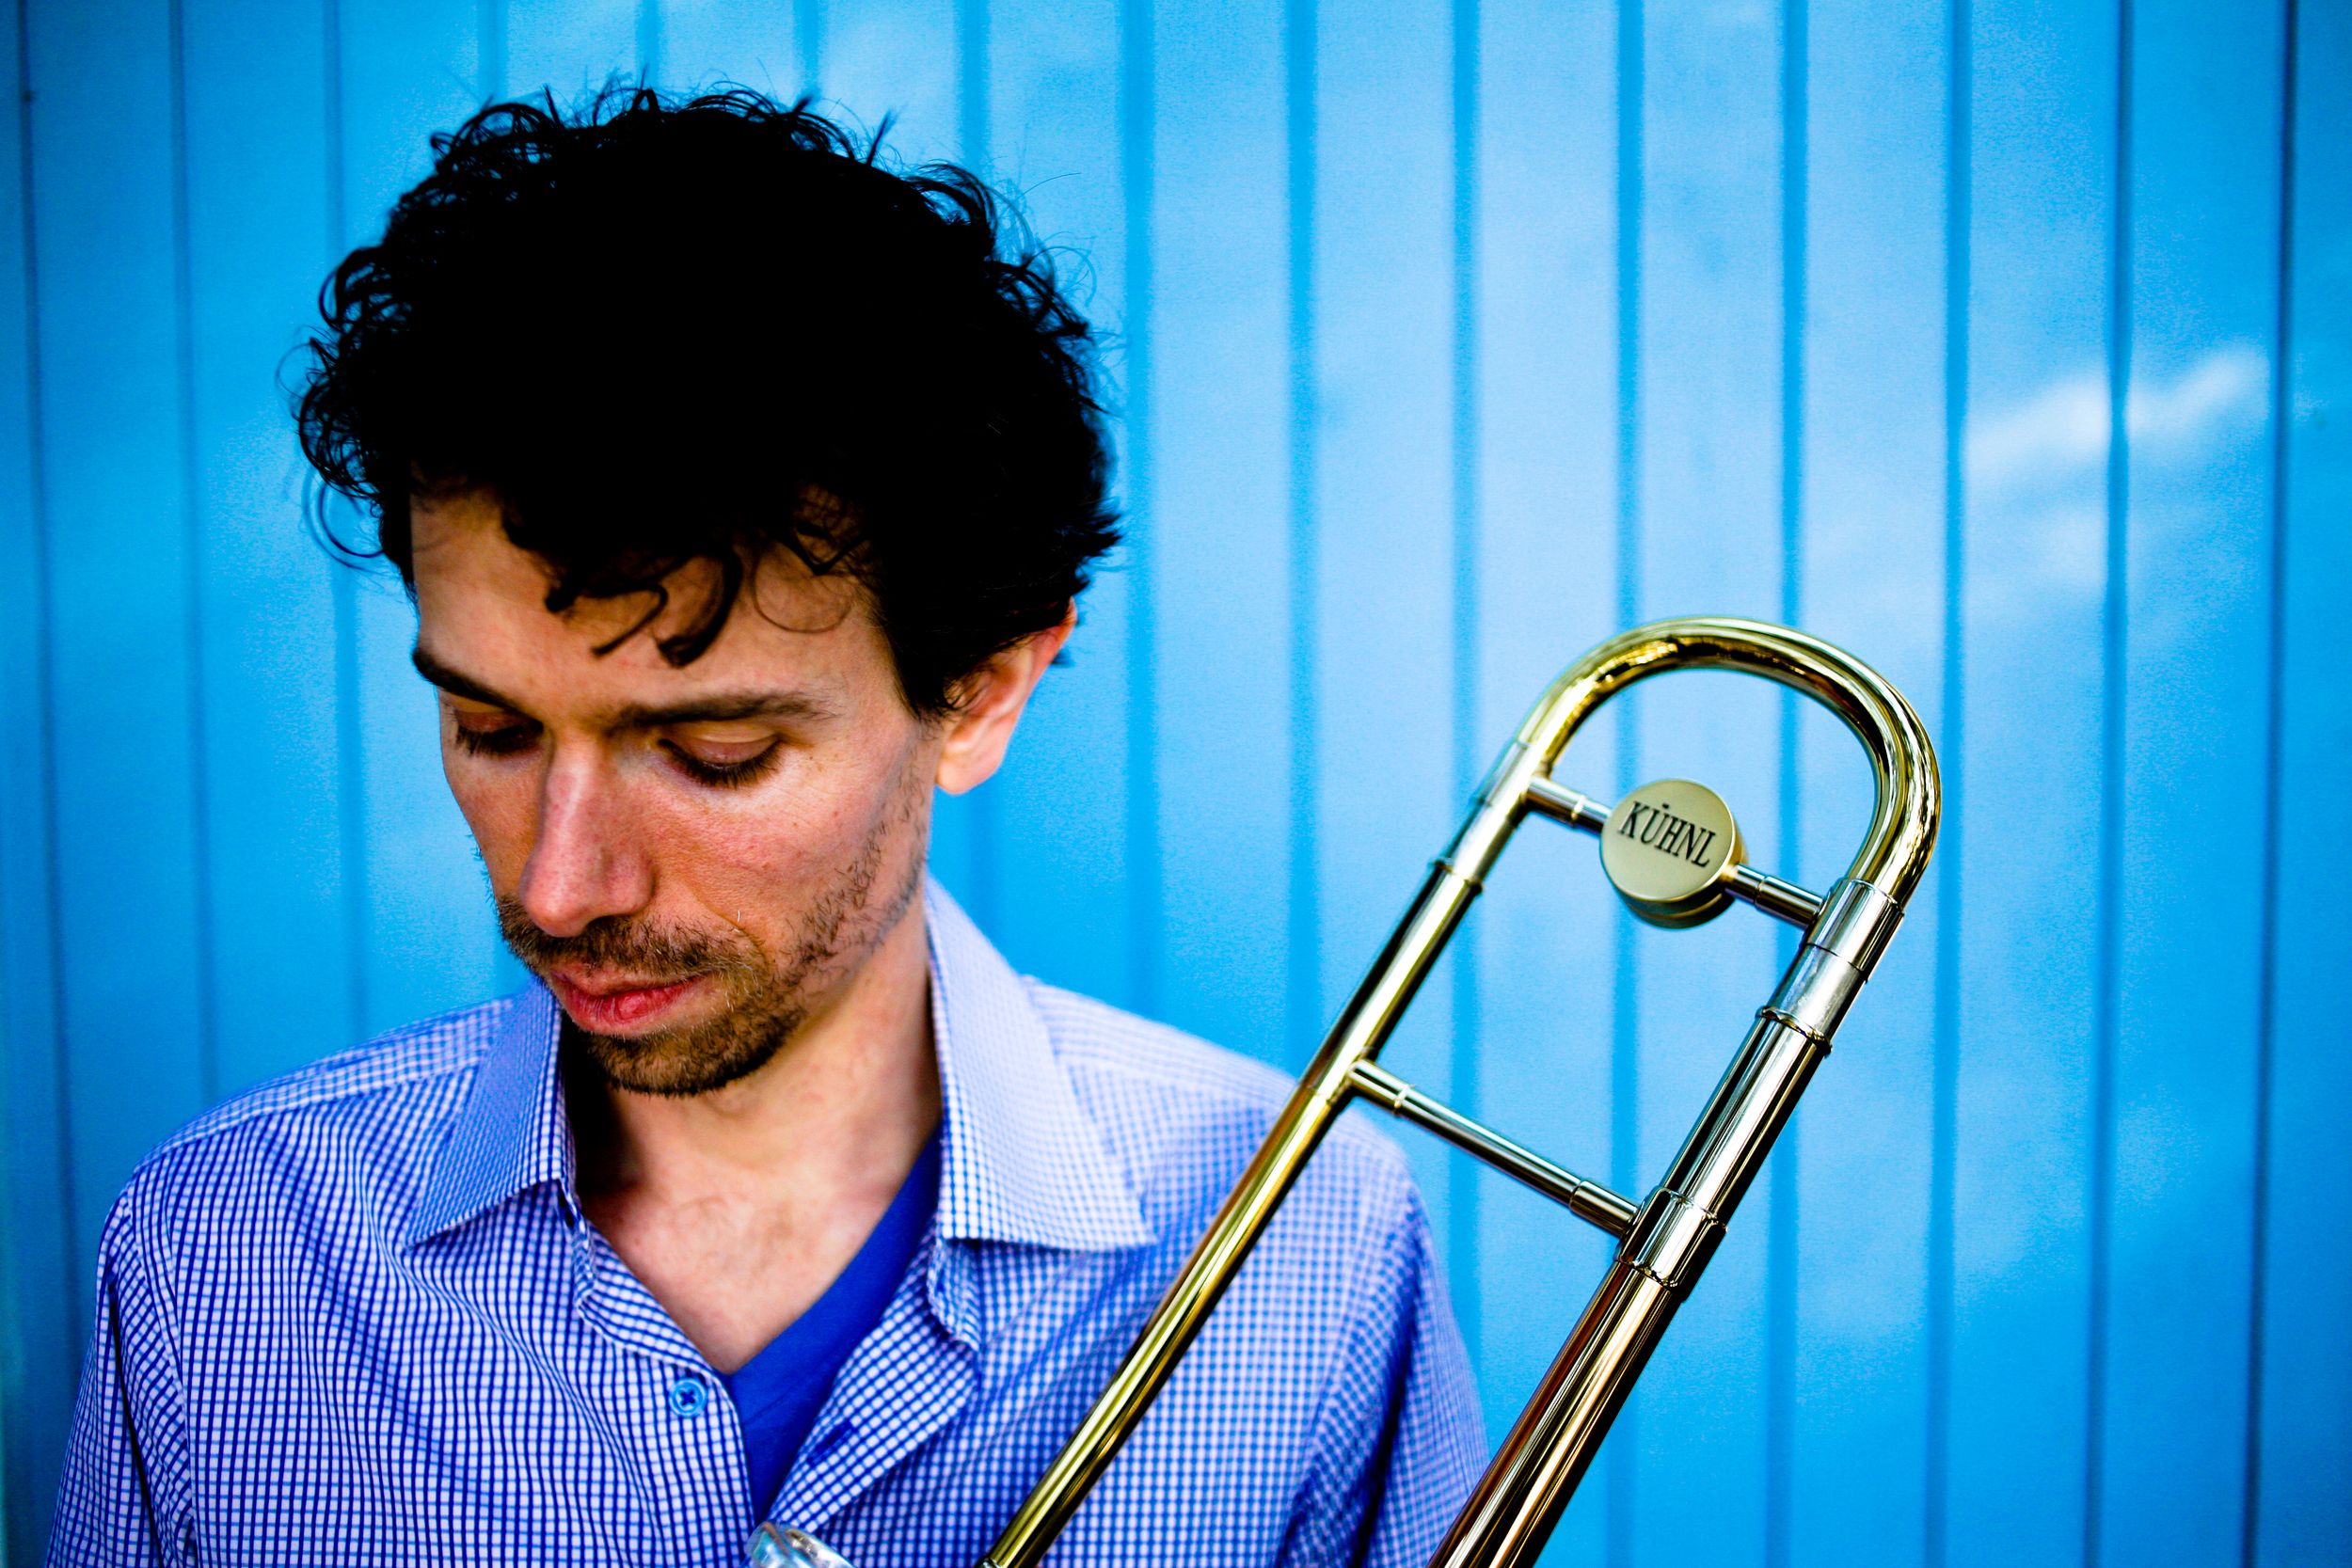 Keberle-with-Trombone